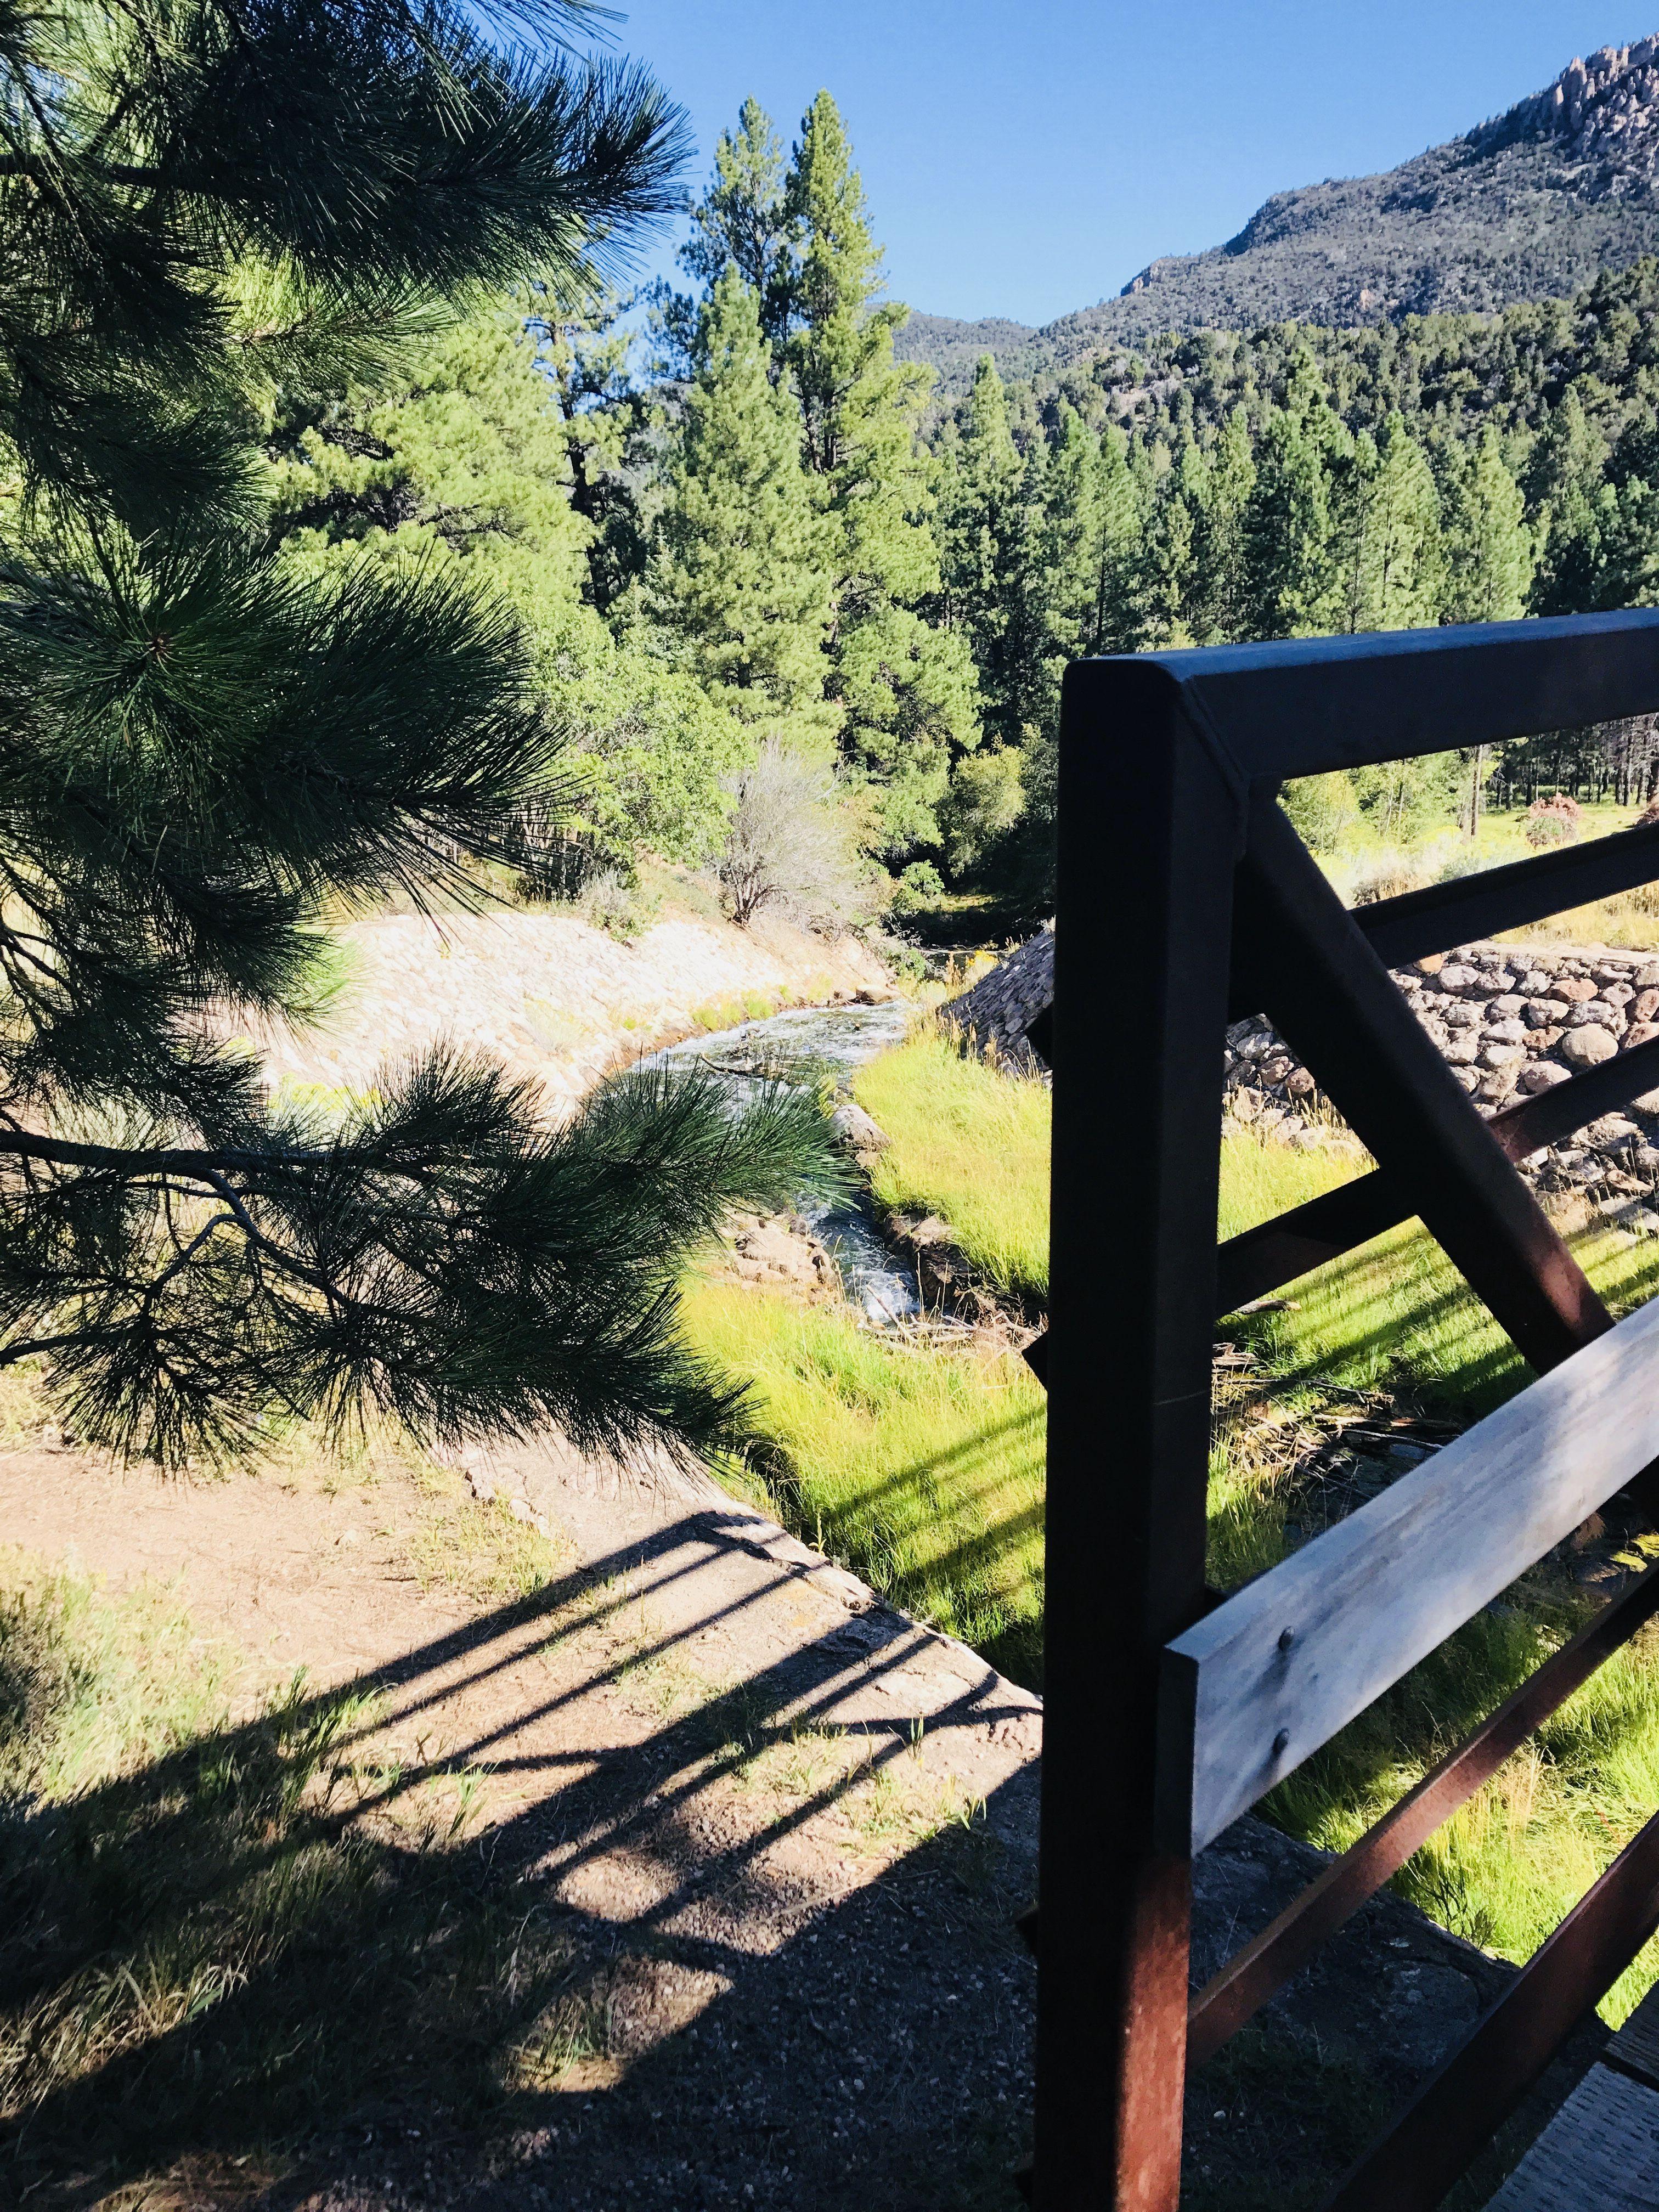 Pine Valley|Utah (With images) | Outdoor, Pine valley utah ...